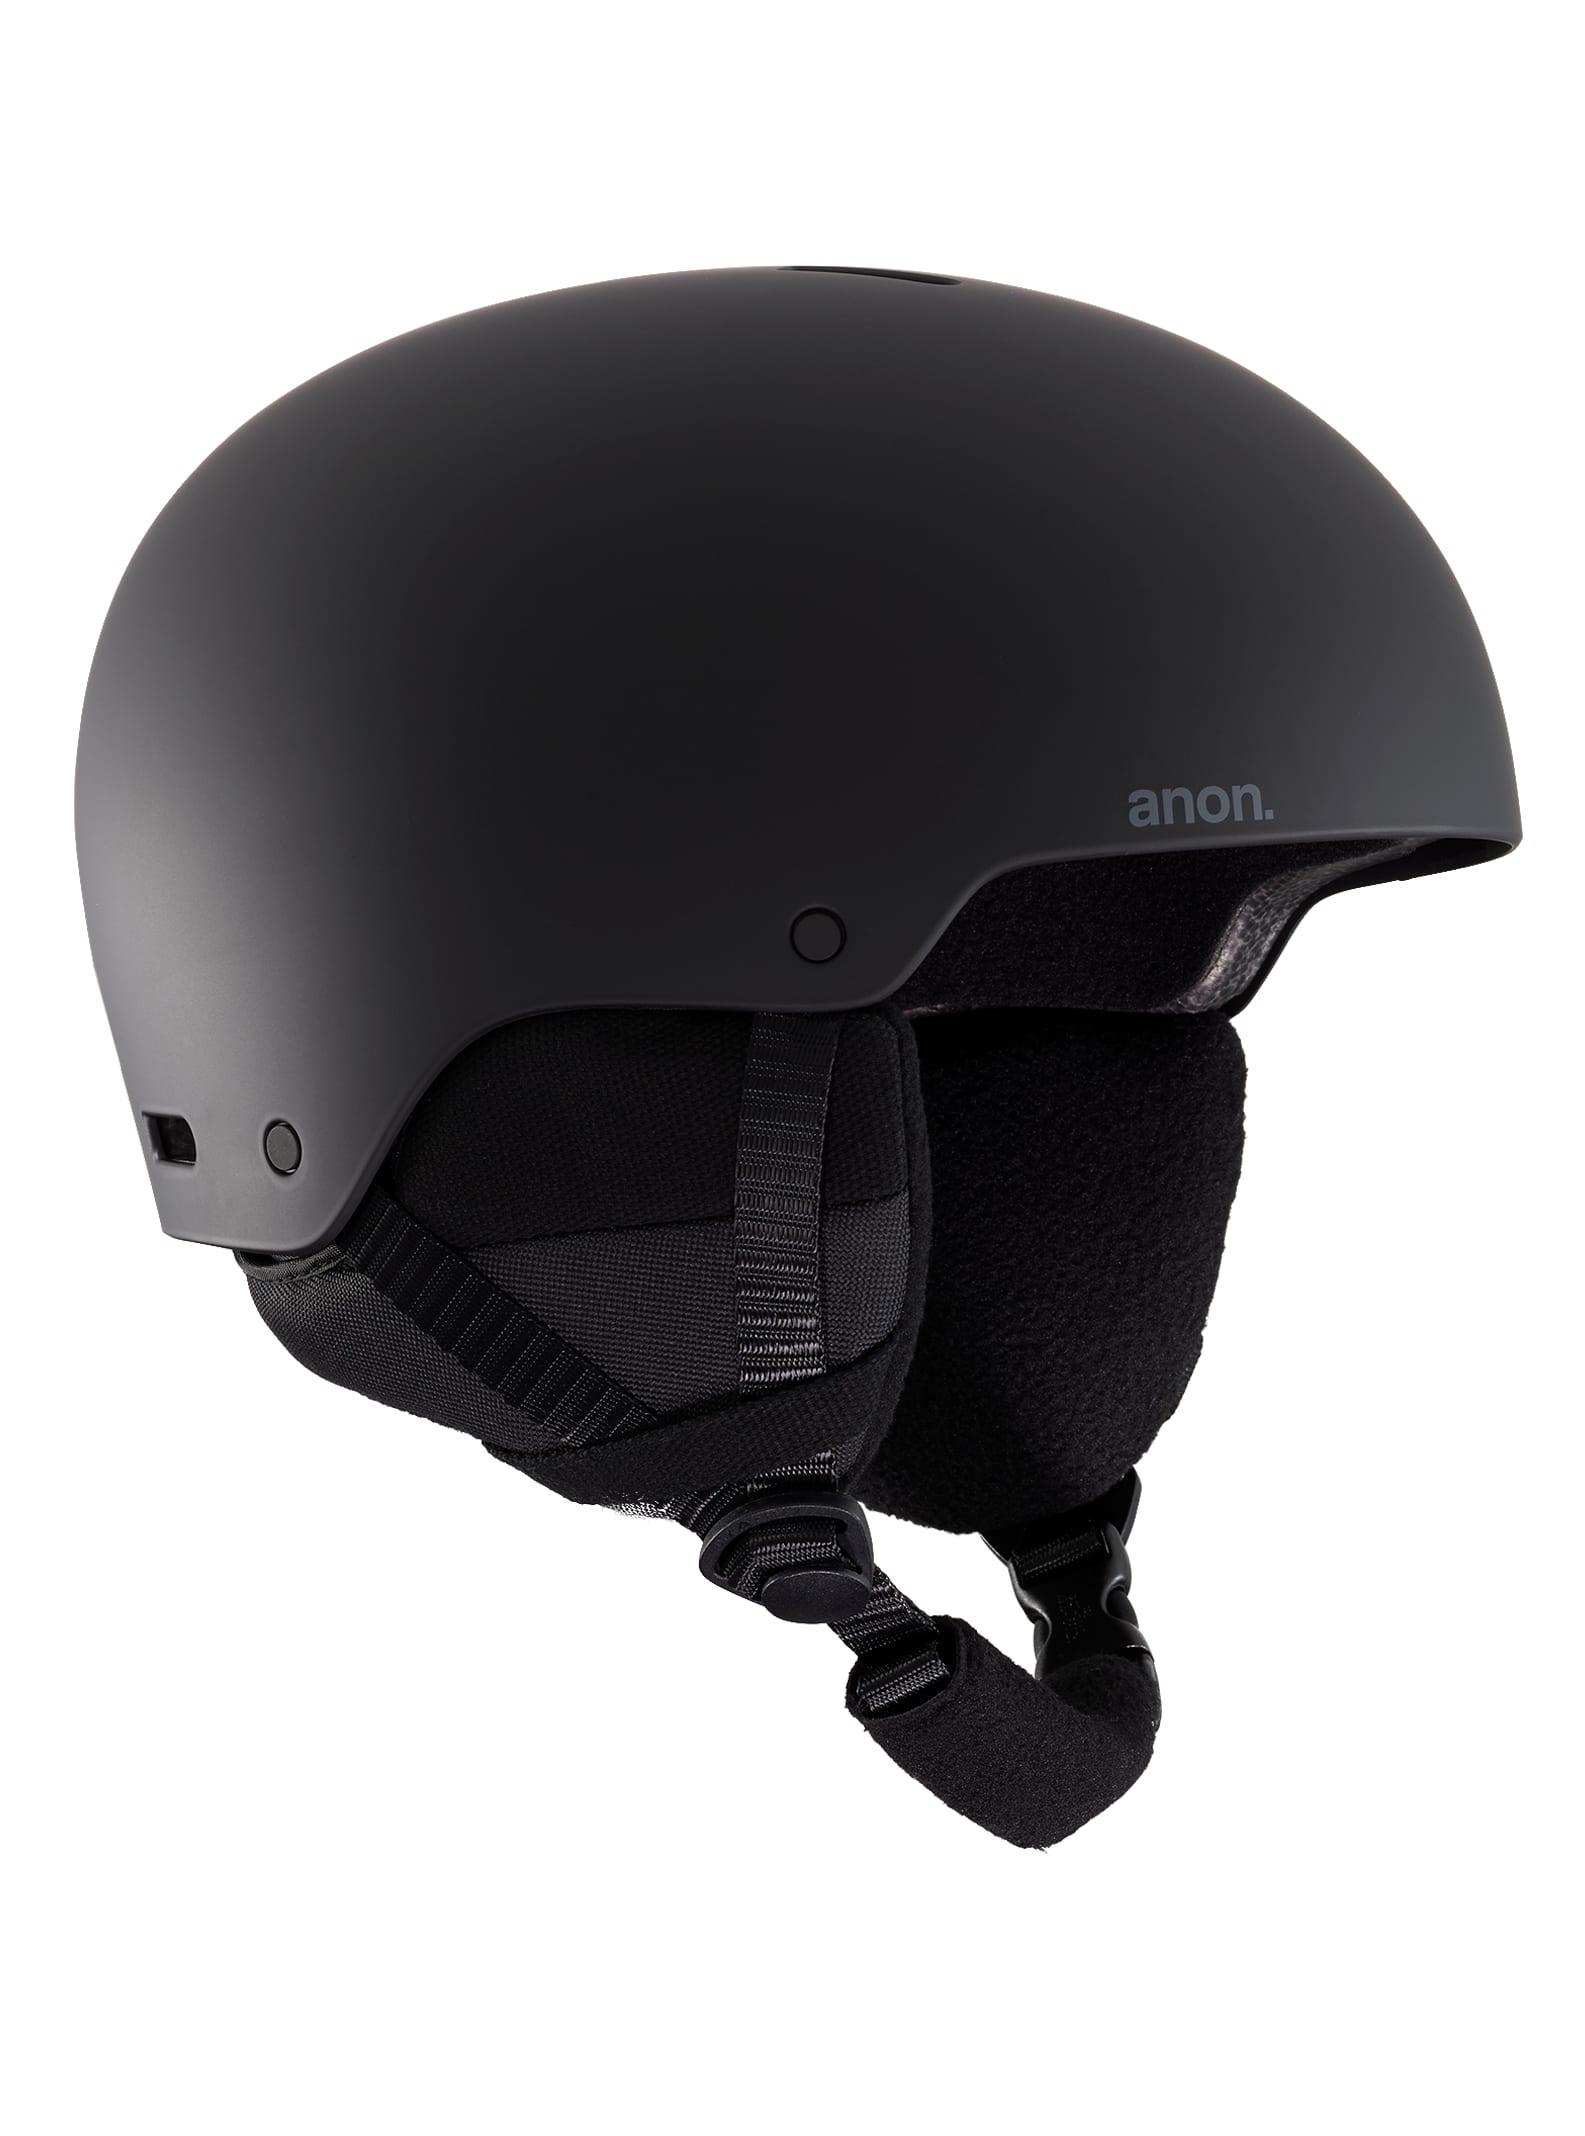 Anon Men's Raider 3 MIPS Helmet, XL